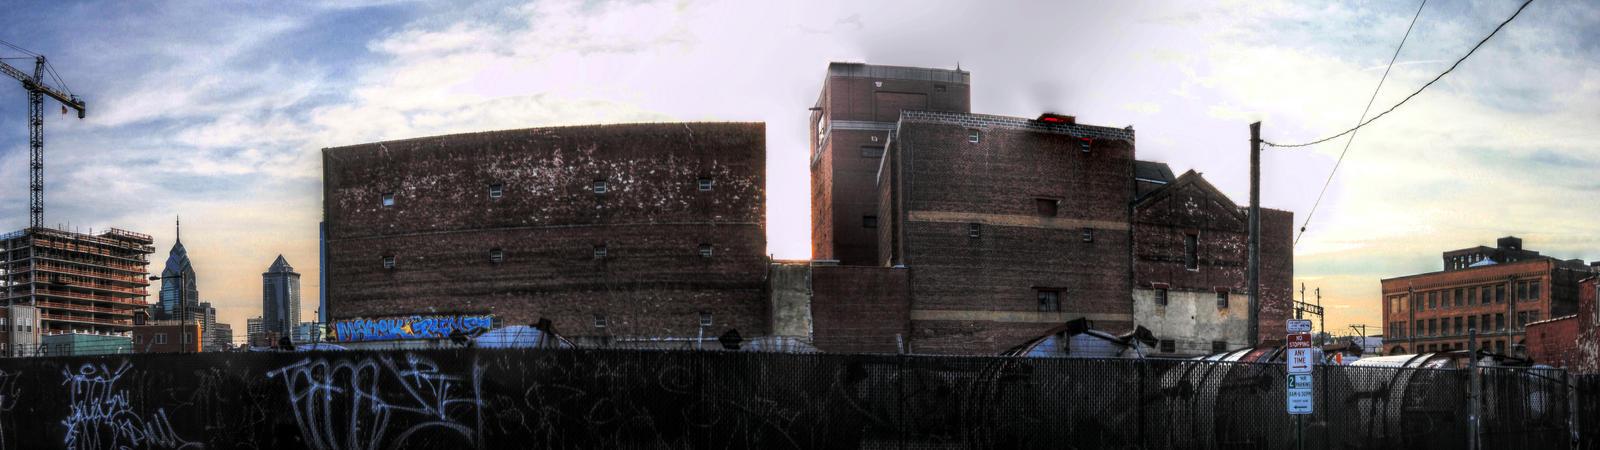 Panorama 3649 hdr pregamma 1 mantiuk06 contrast ma by bruhinb